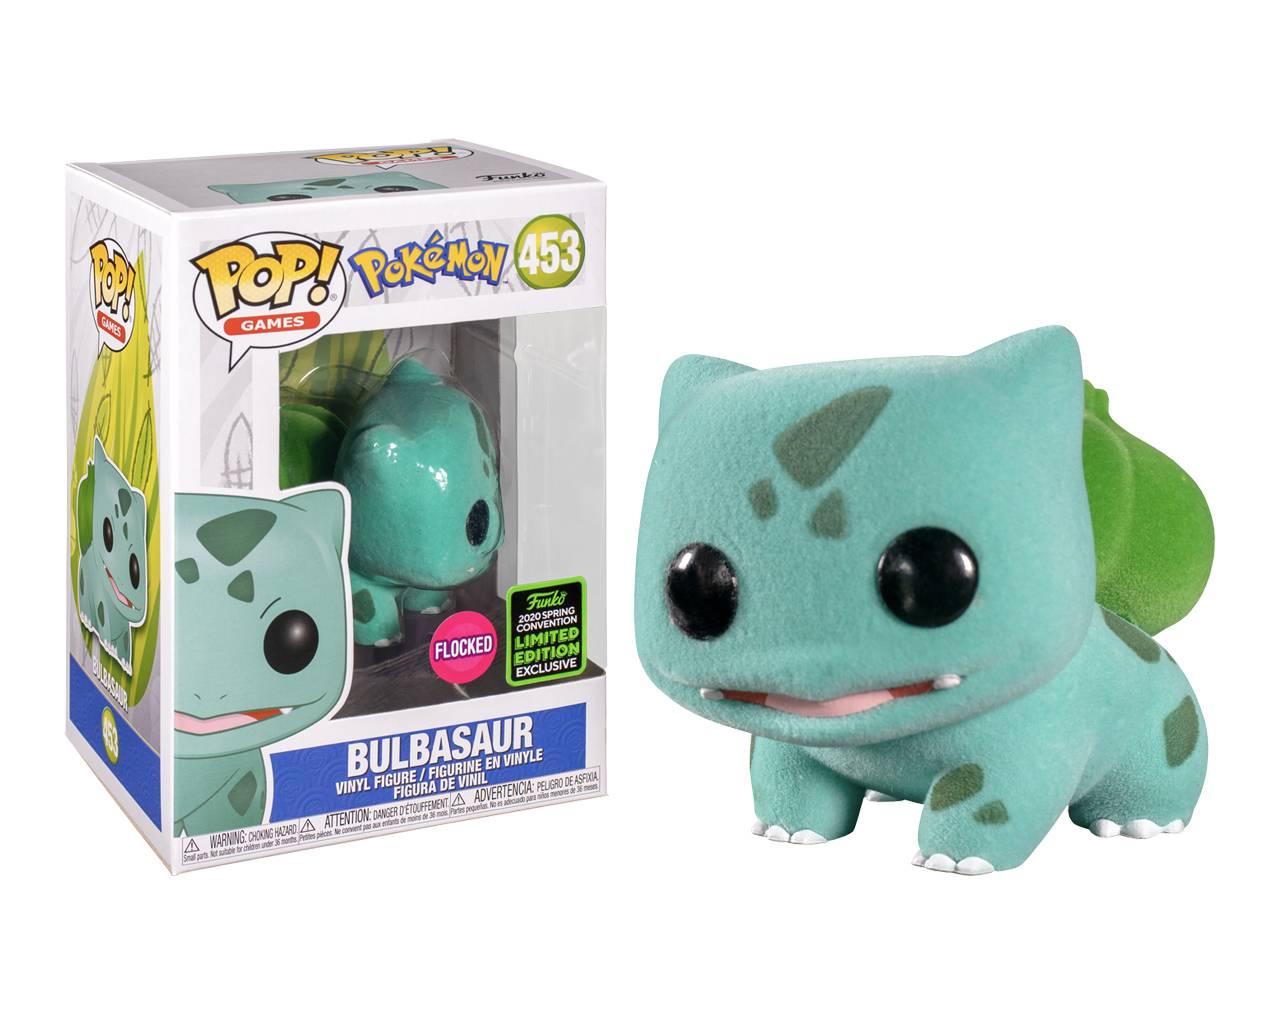 Bulbasaur (Flocked ECCC2020) Pop! Vinyl